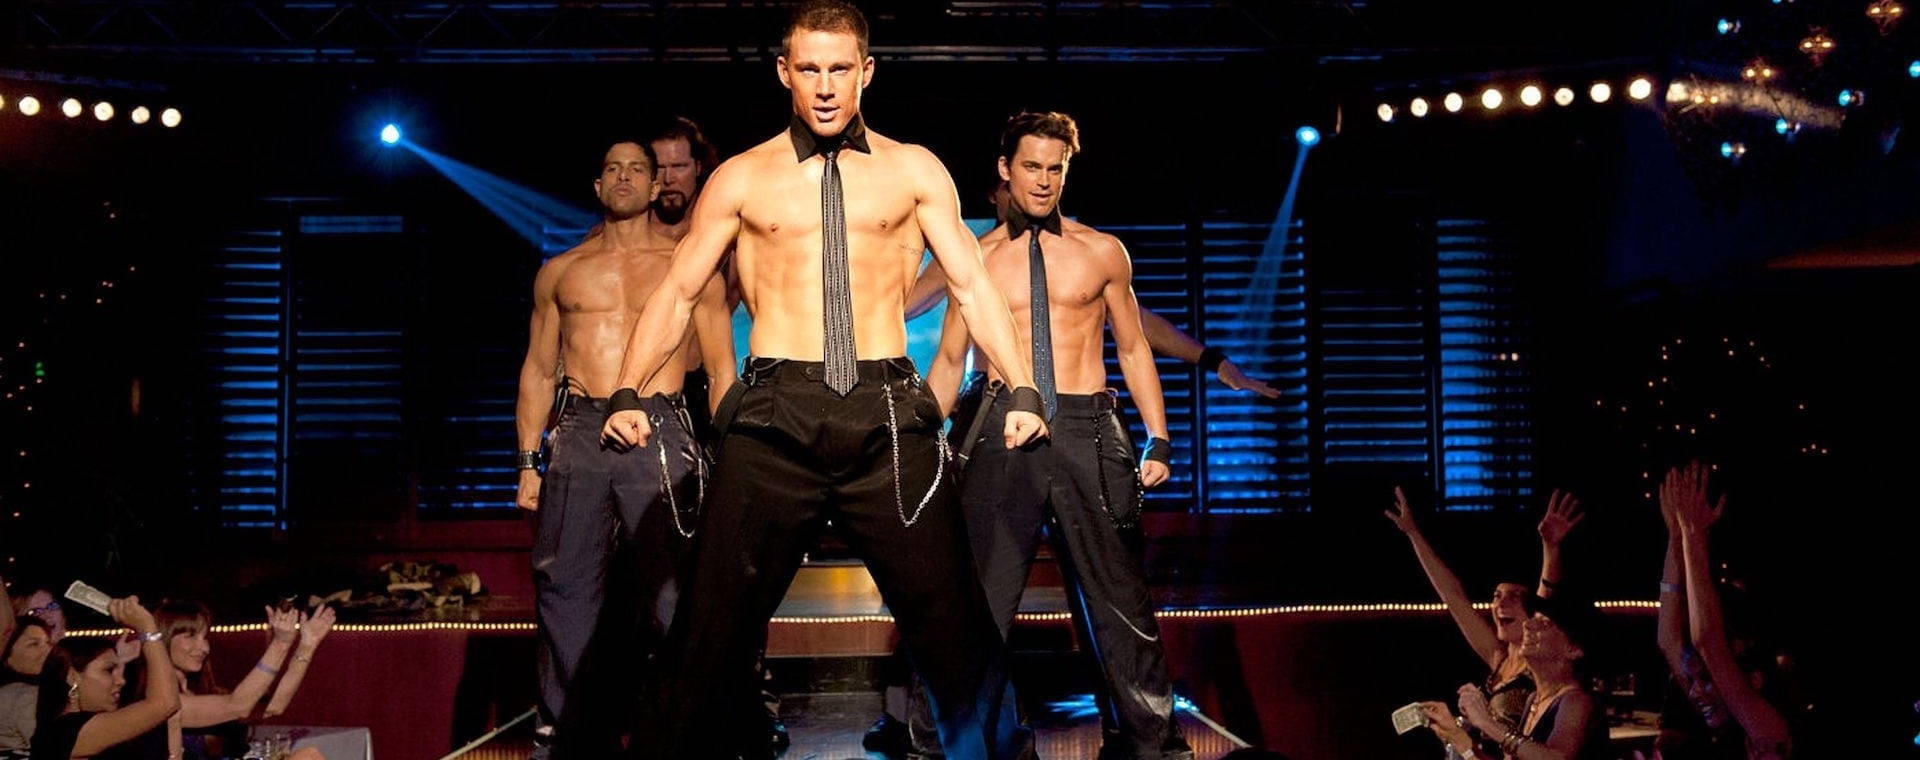 male stripper bangkok cover